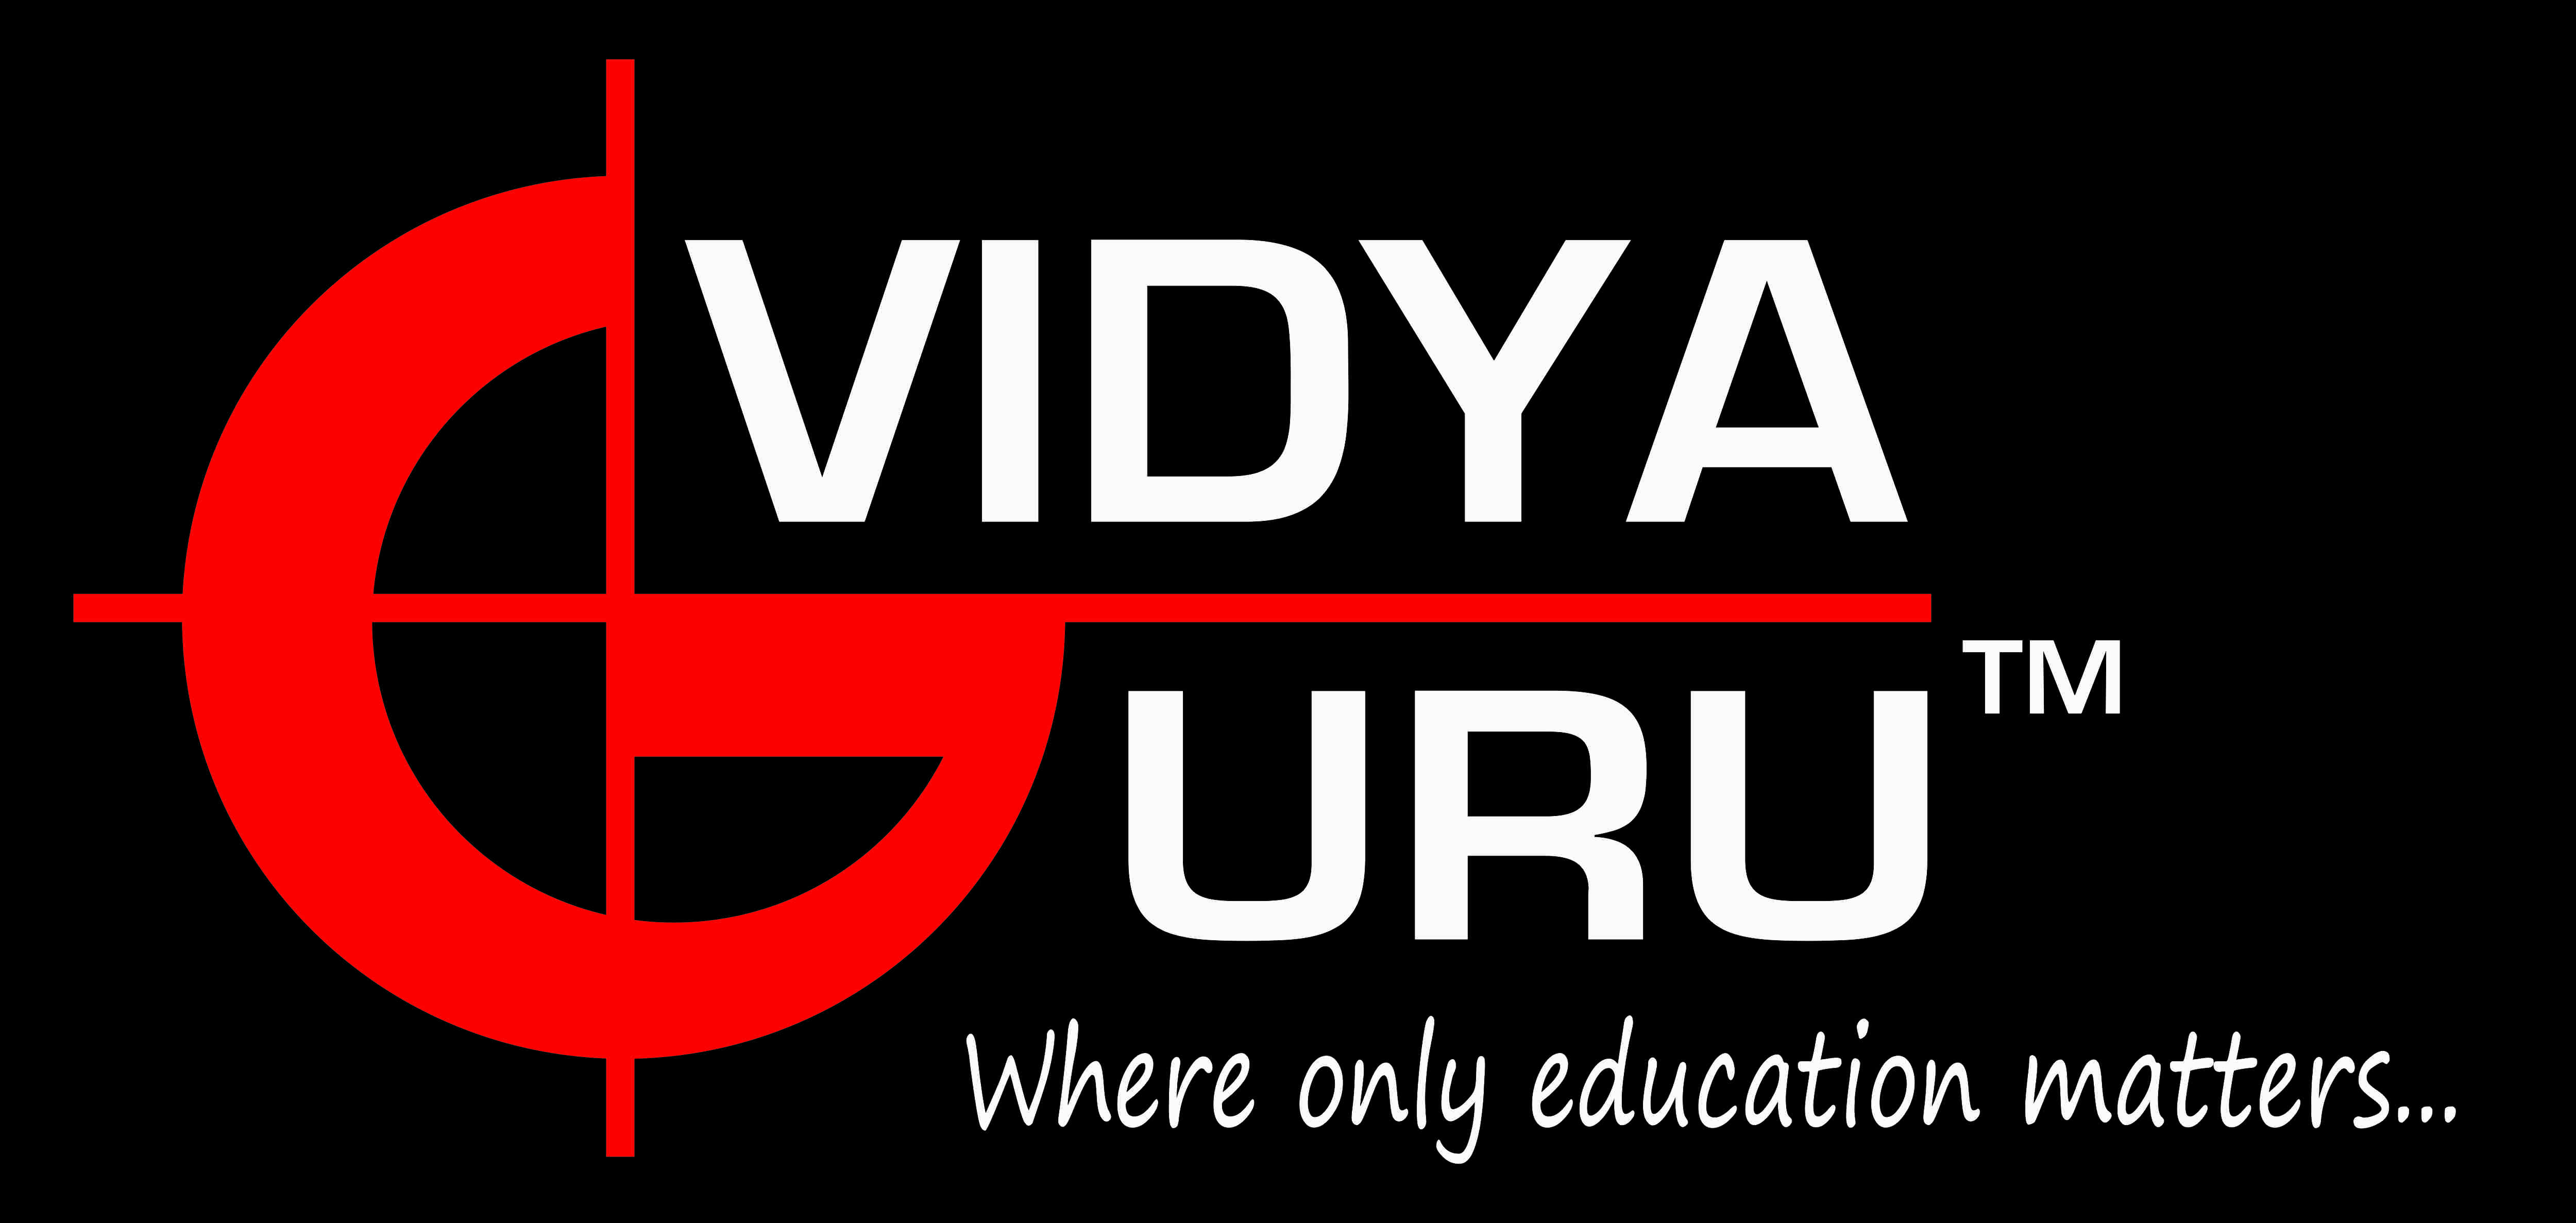 Vidya Guru Education Pvt Ltd